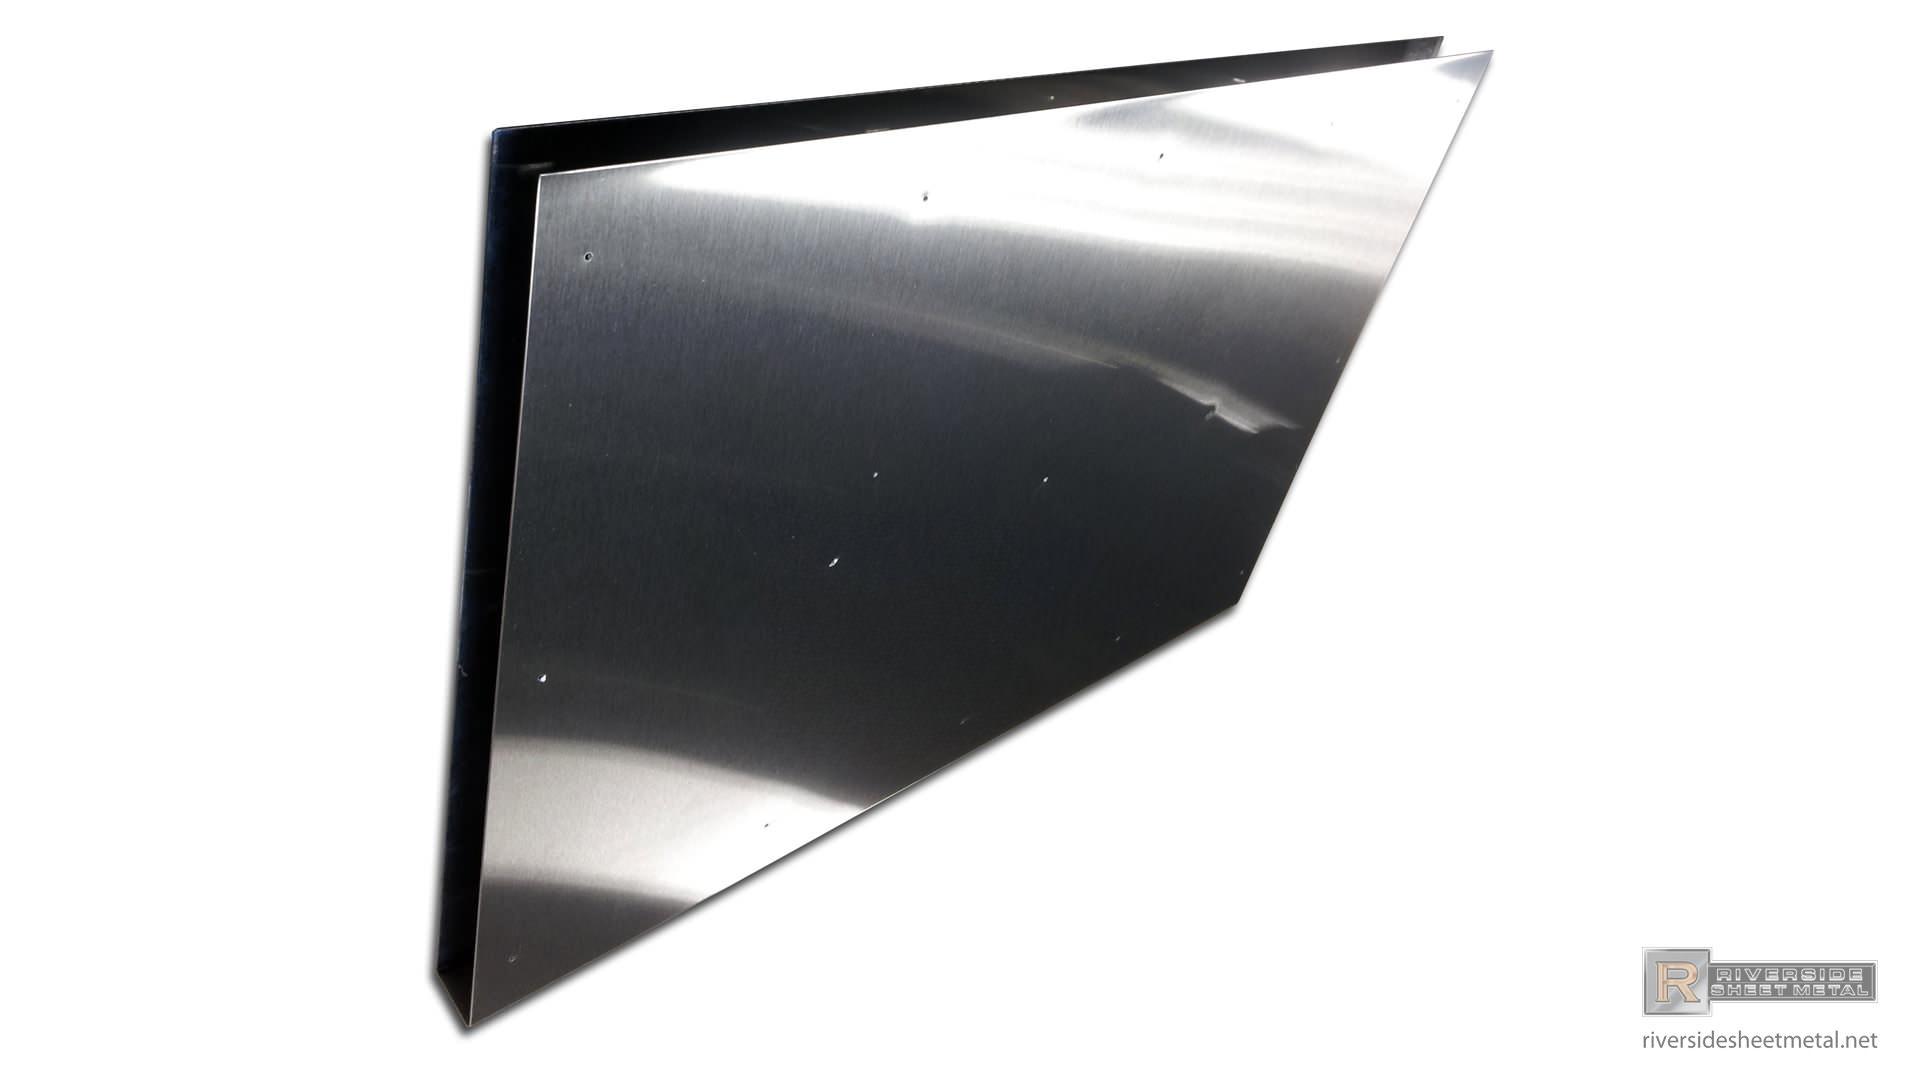 Door kick plate - Riverside Sheet Metal - USA